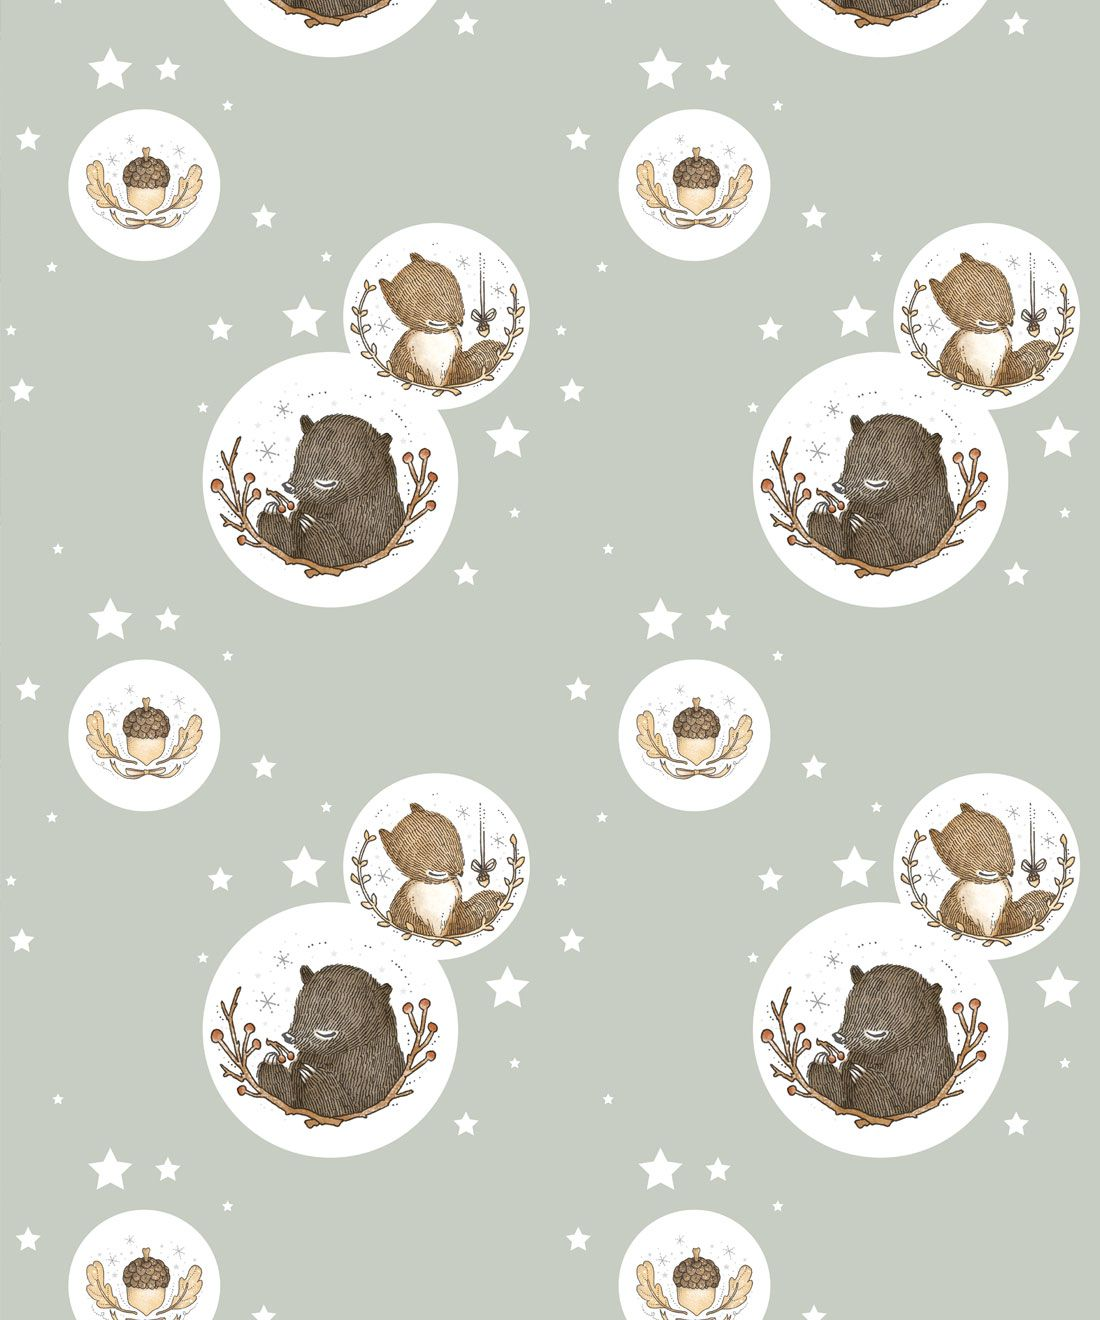 Bear & Squirrel Wallpaper